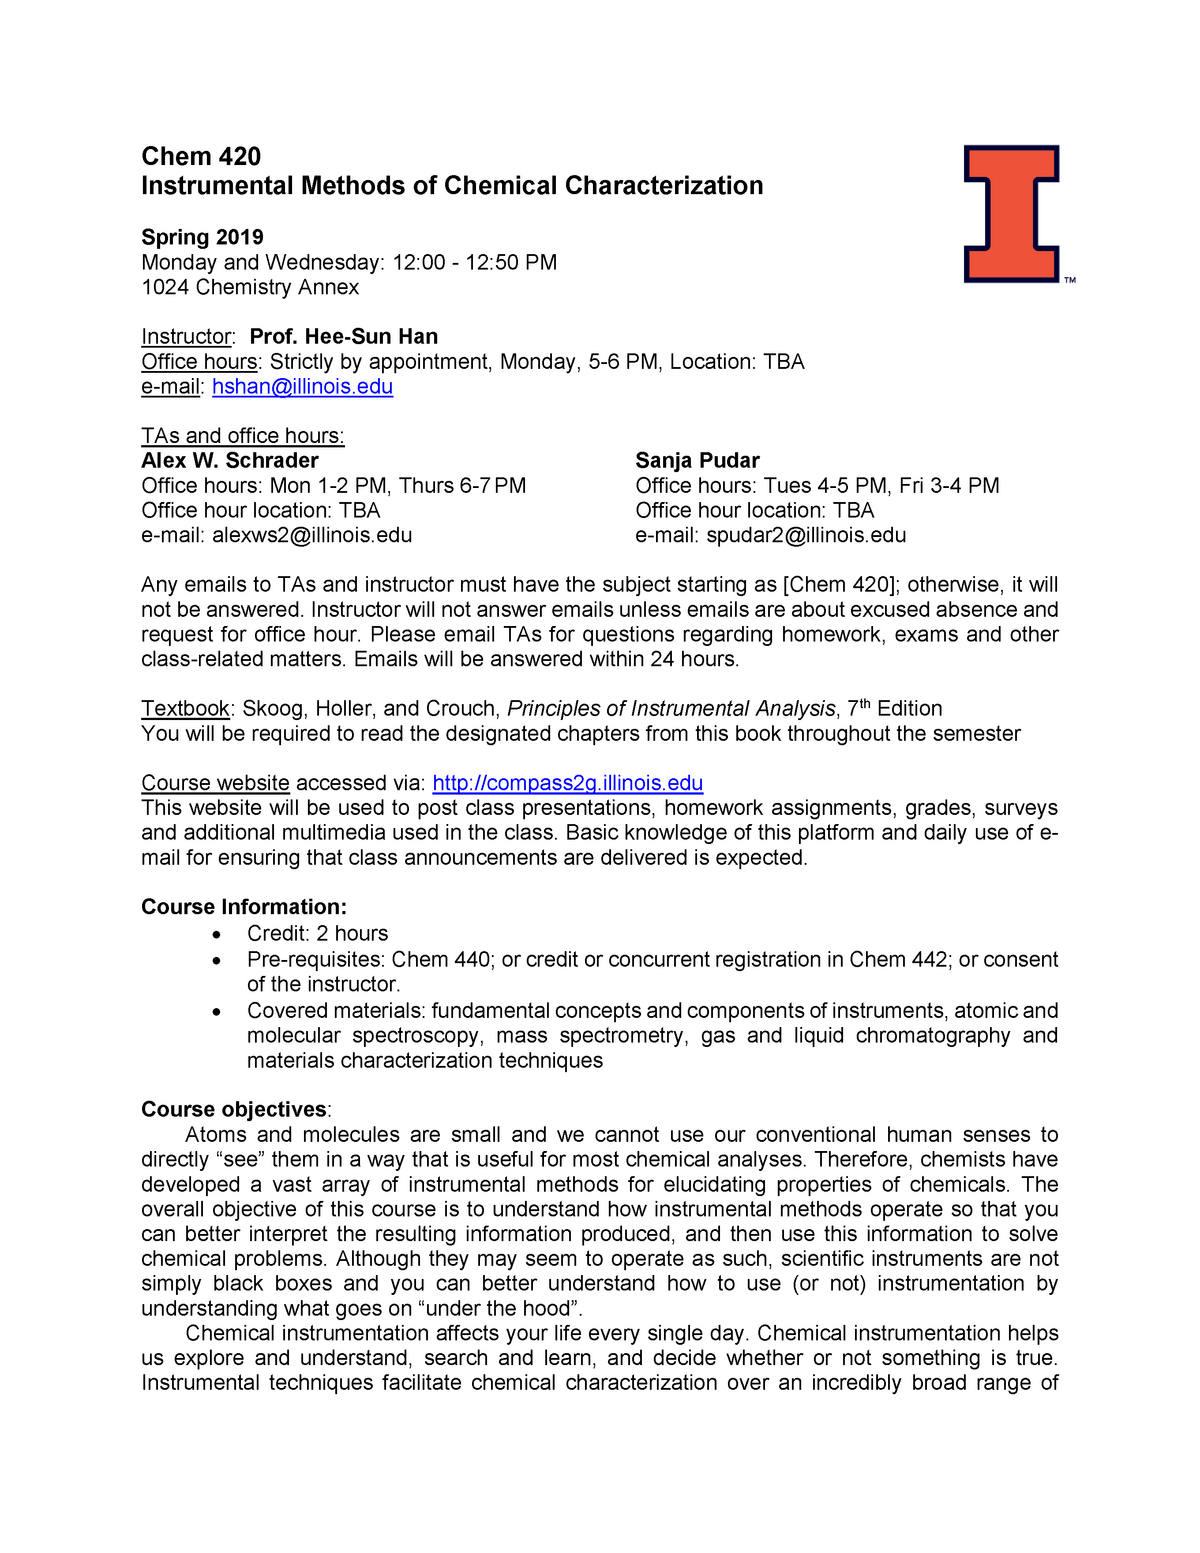 Chem 420 Spring 2019 Syllabus - CHEM 420 - Illinois - StuDocu